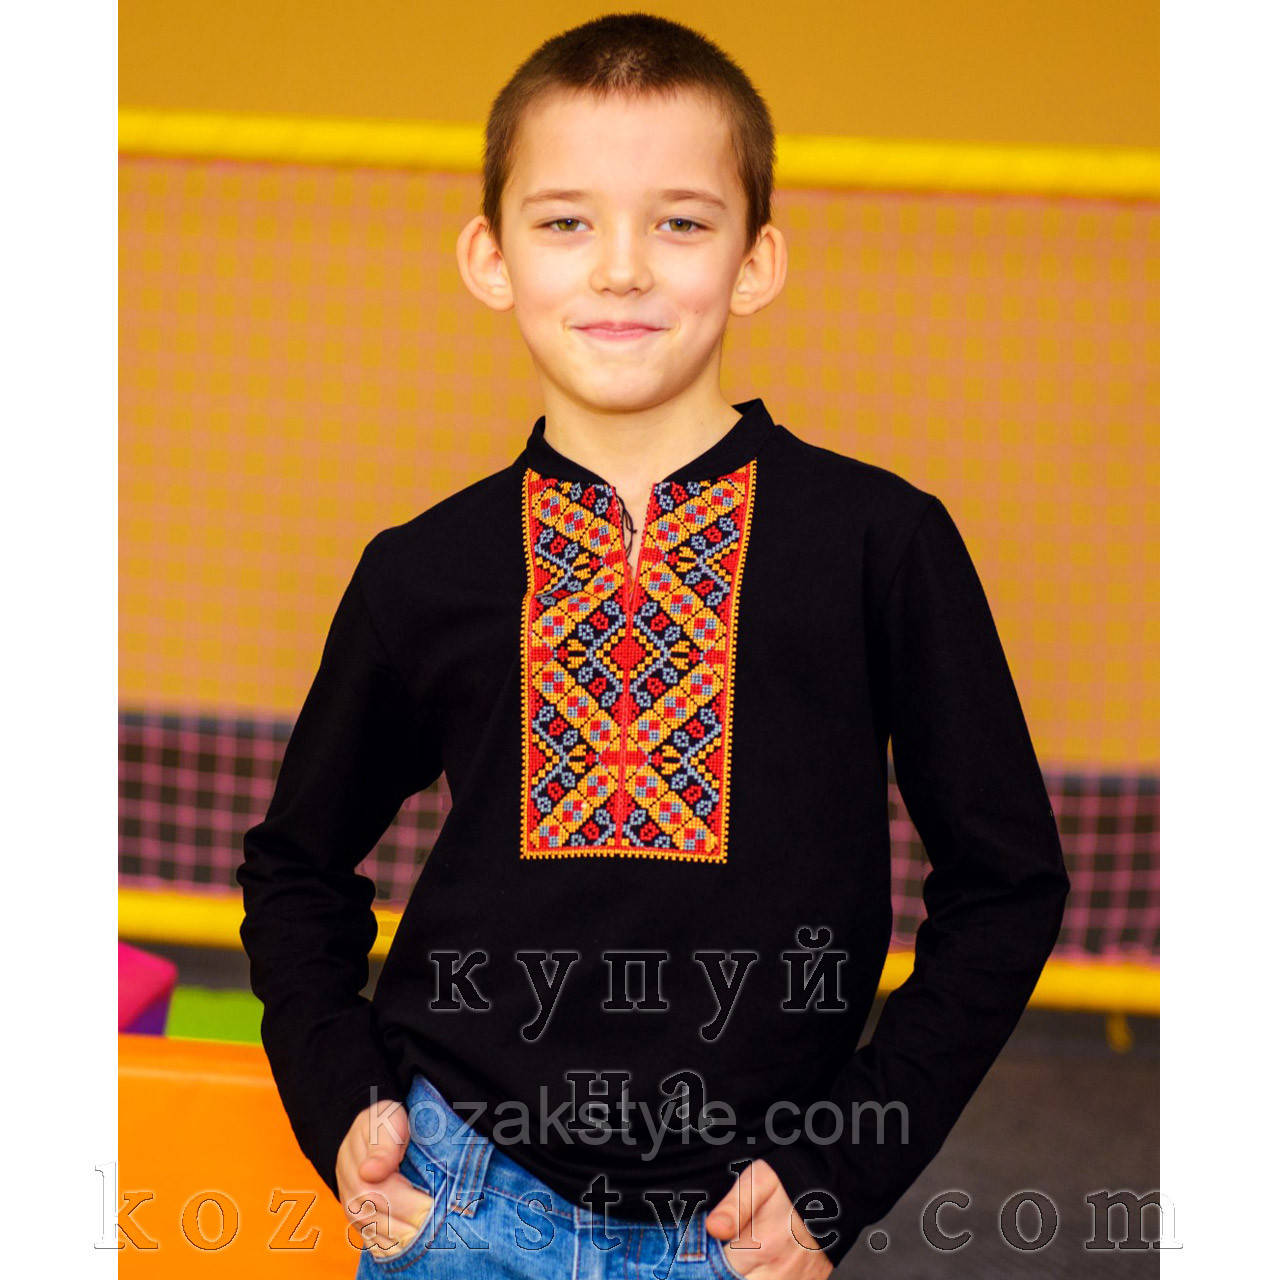 Вишита футболка для хлопчика з жовтогарячою вишивкою